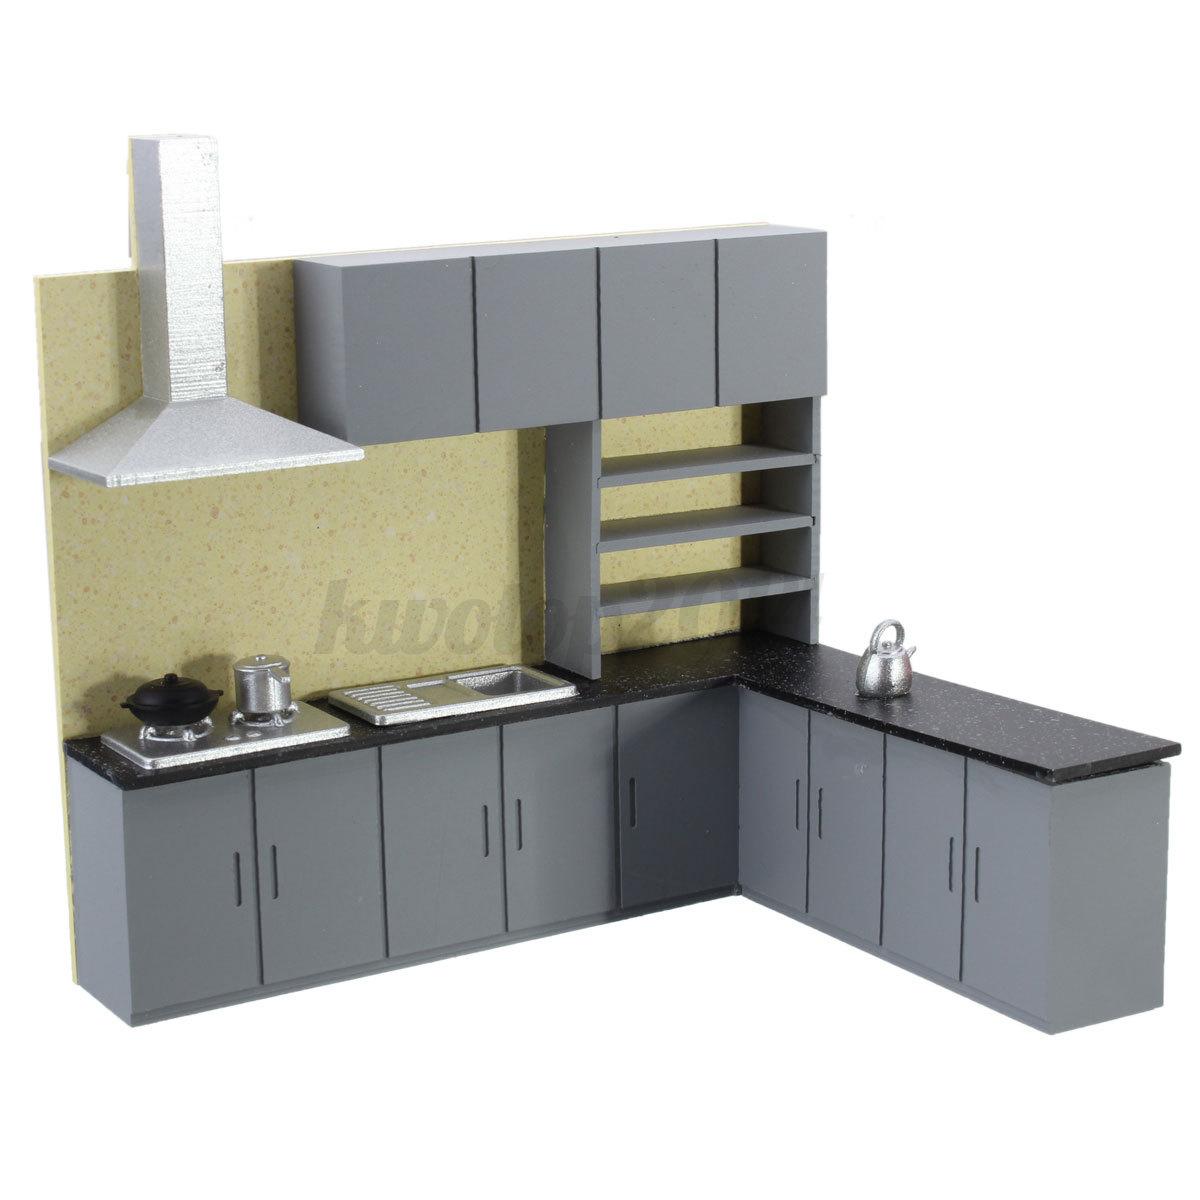 miniature kitchen cabinet set model kit furniture for art dollhouse 1 25 scale. Black Bedroom Furniture Sets. Home Design Ideas